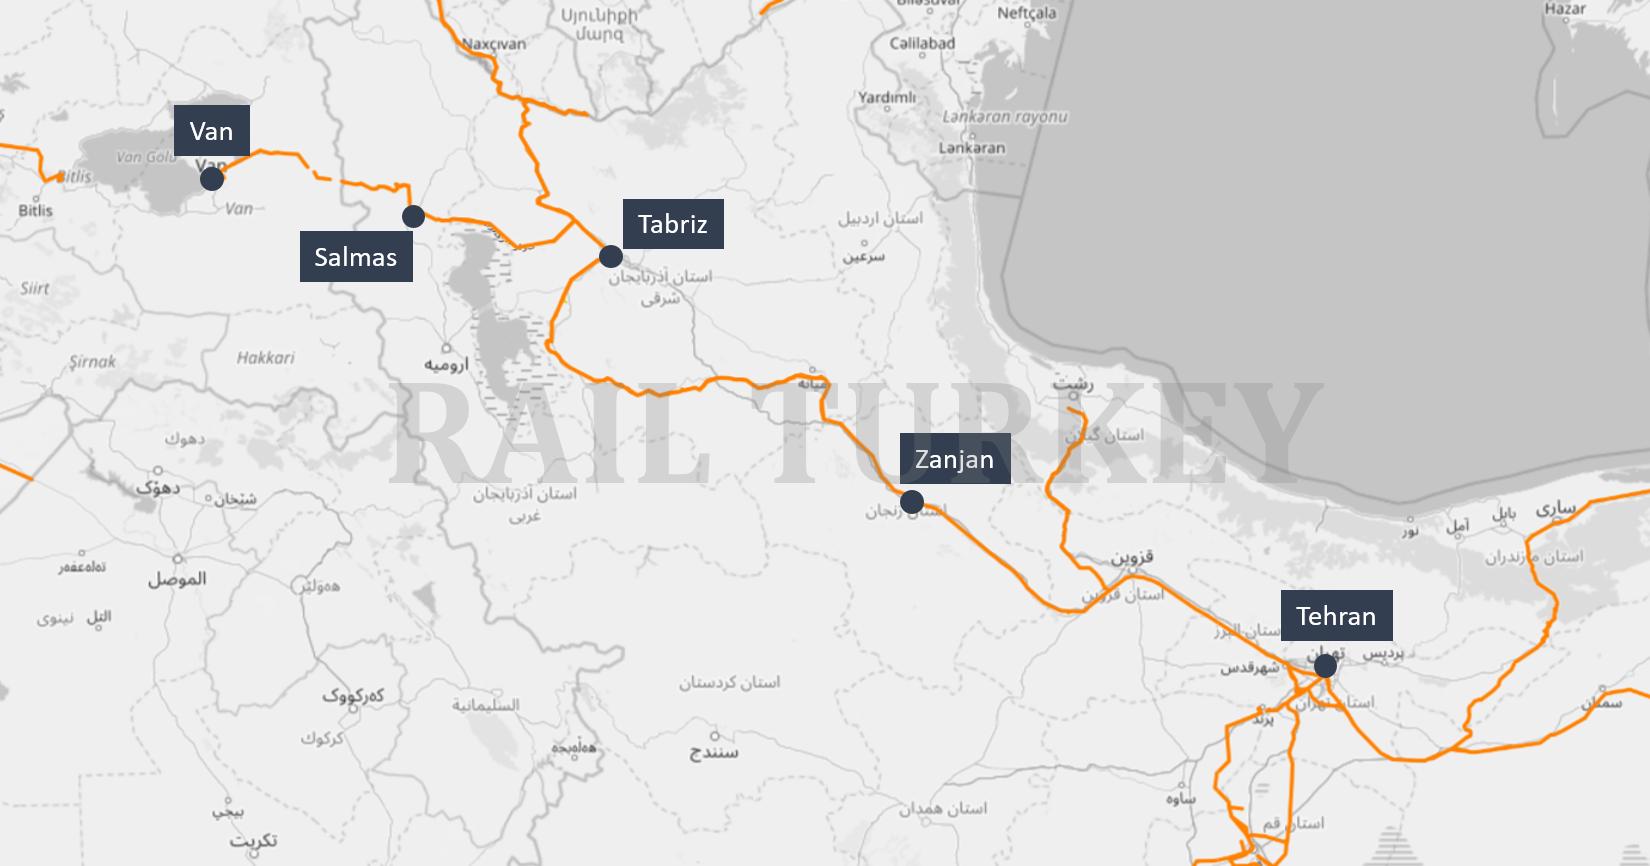 Tehran Van train route